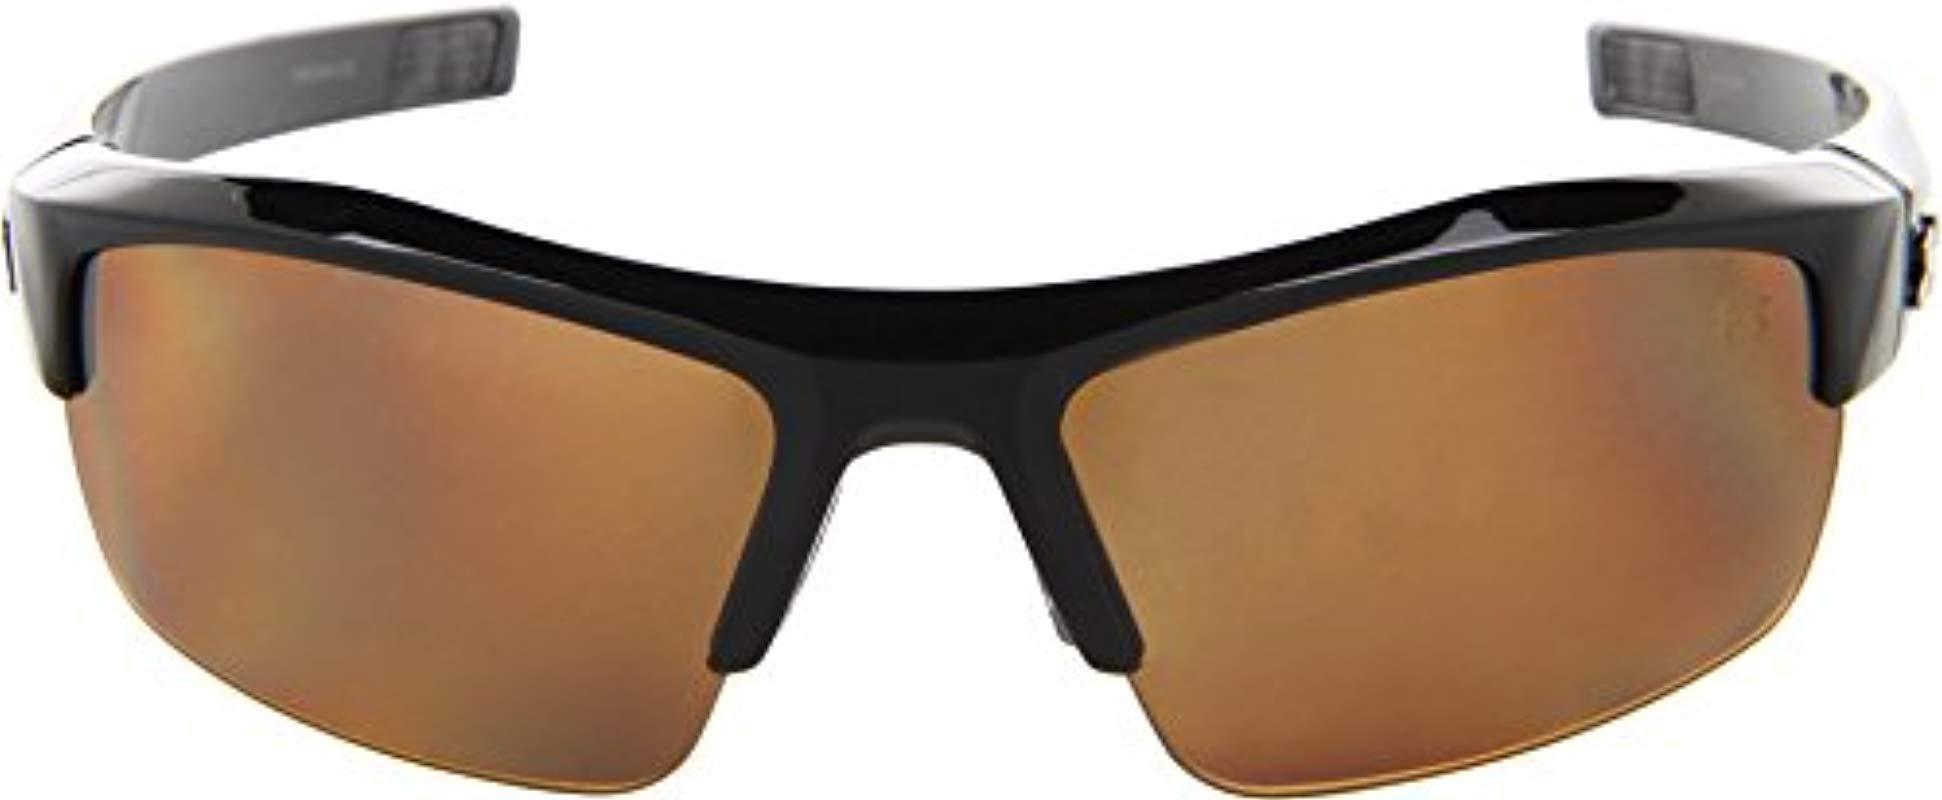 b1bbeee814 Under Armour - Black Igniter Polarized Multiflection Sunglasses - Lyst.  View fullscreen